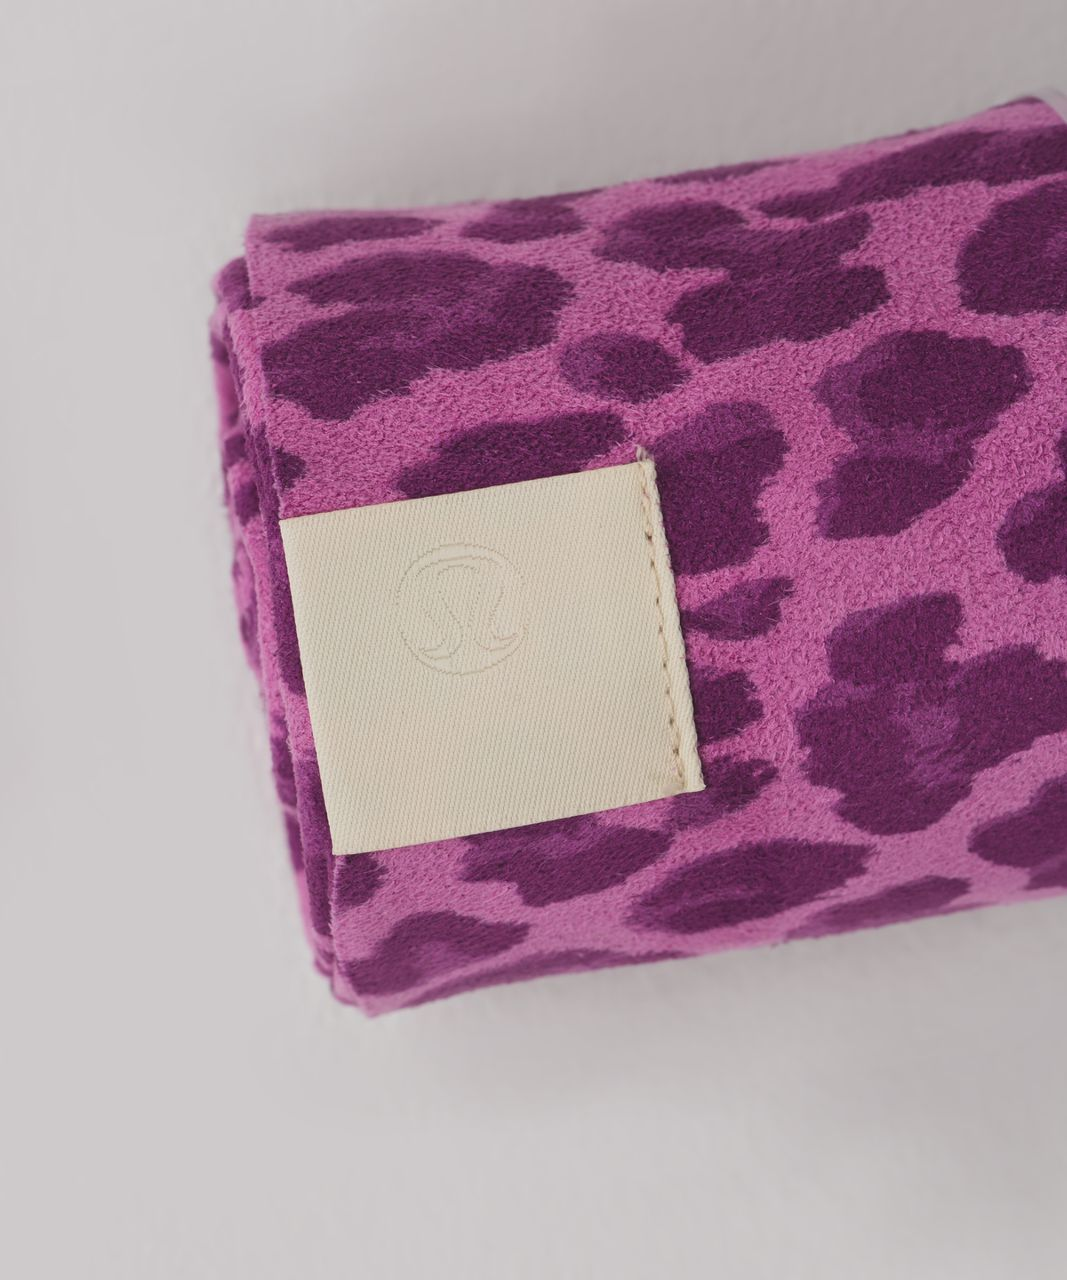 Lululemon The Towel - Mini Cherry Cheetah Mellow Magenta Ultra Violet